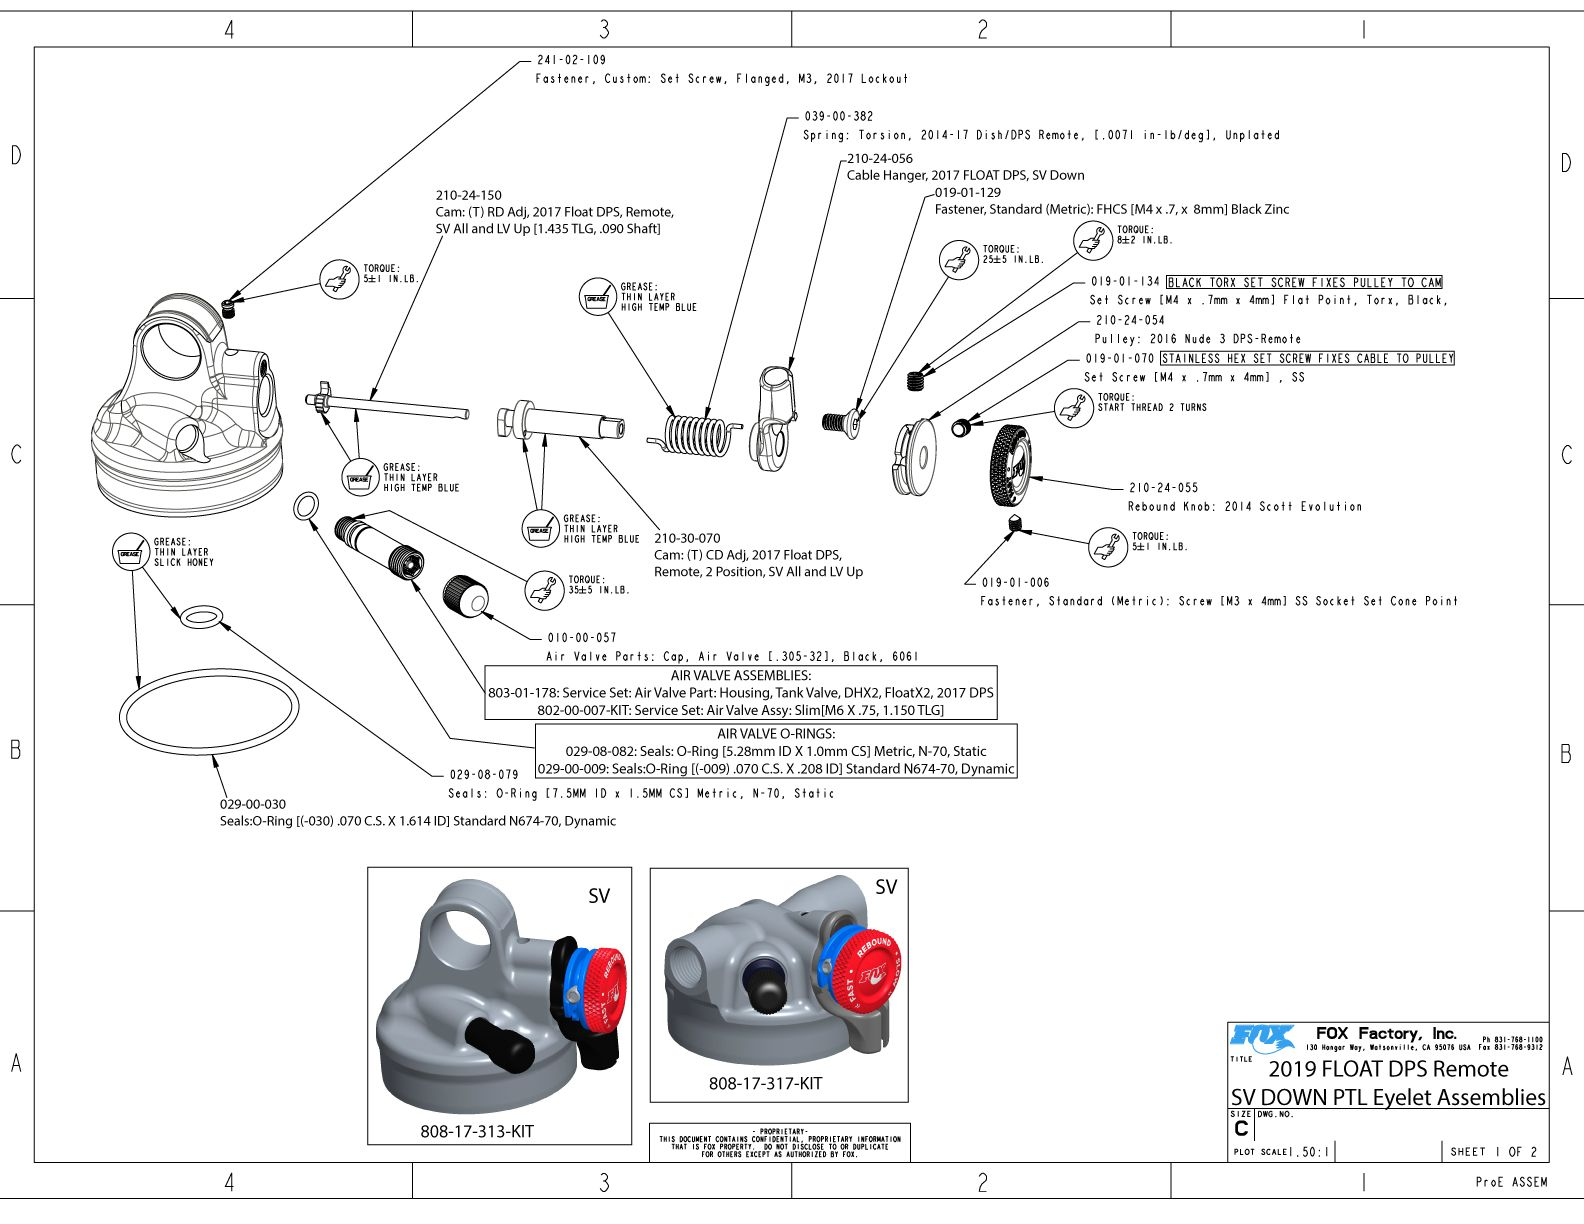 2019 FOX FLOAT DPS 190 X 45 mm Metric EVOL LV Factory Series Rear Shock Kashima